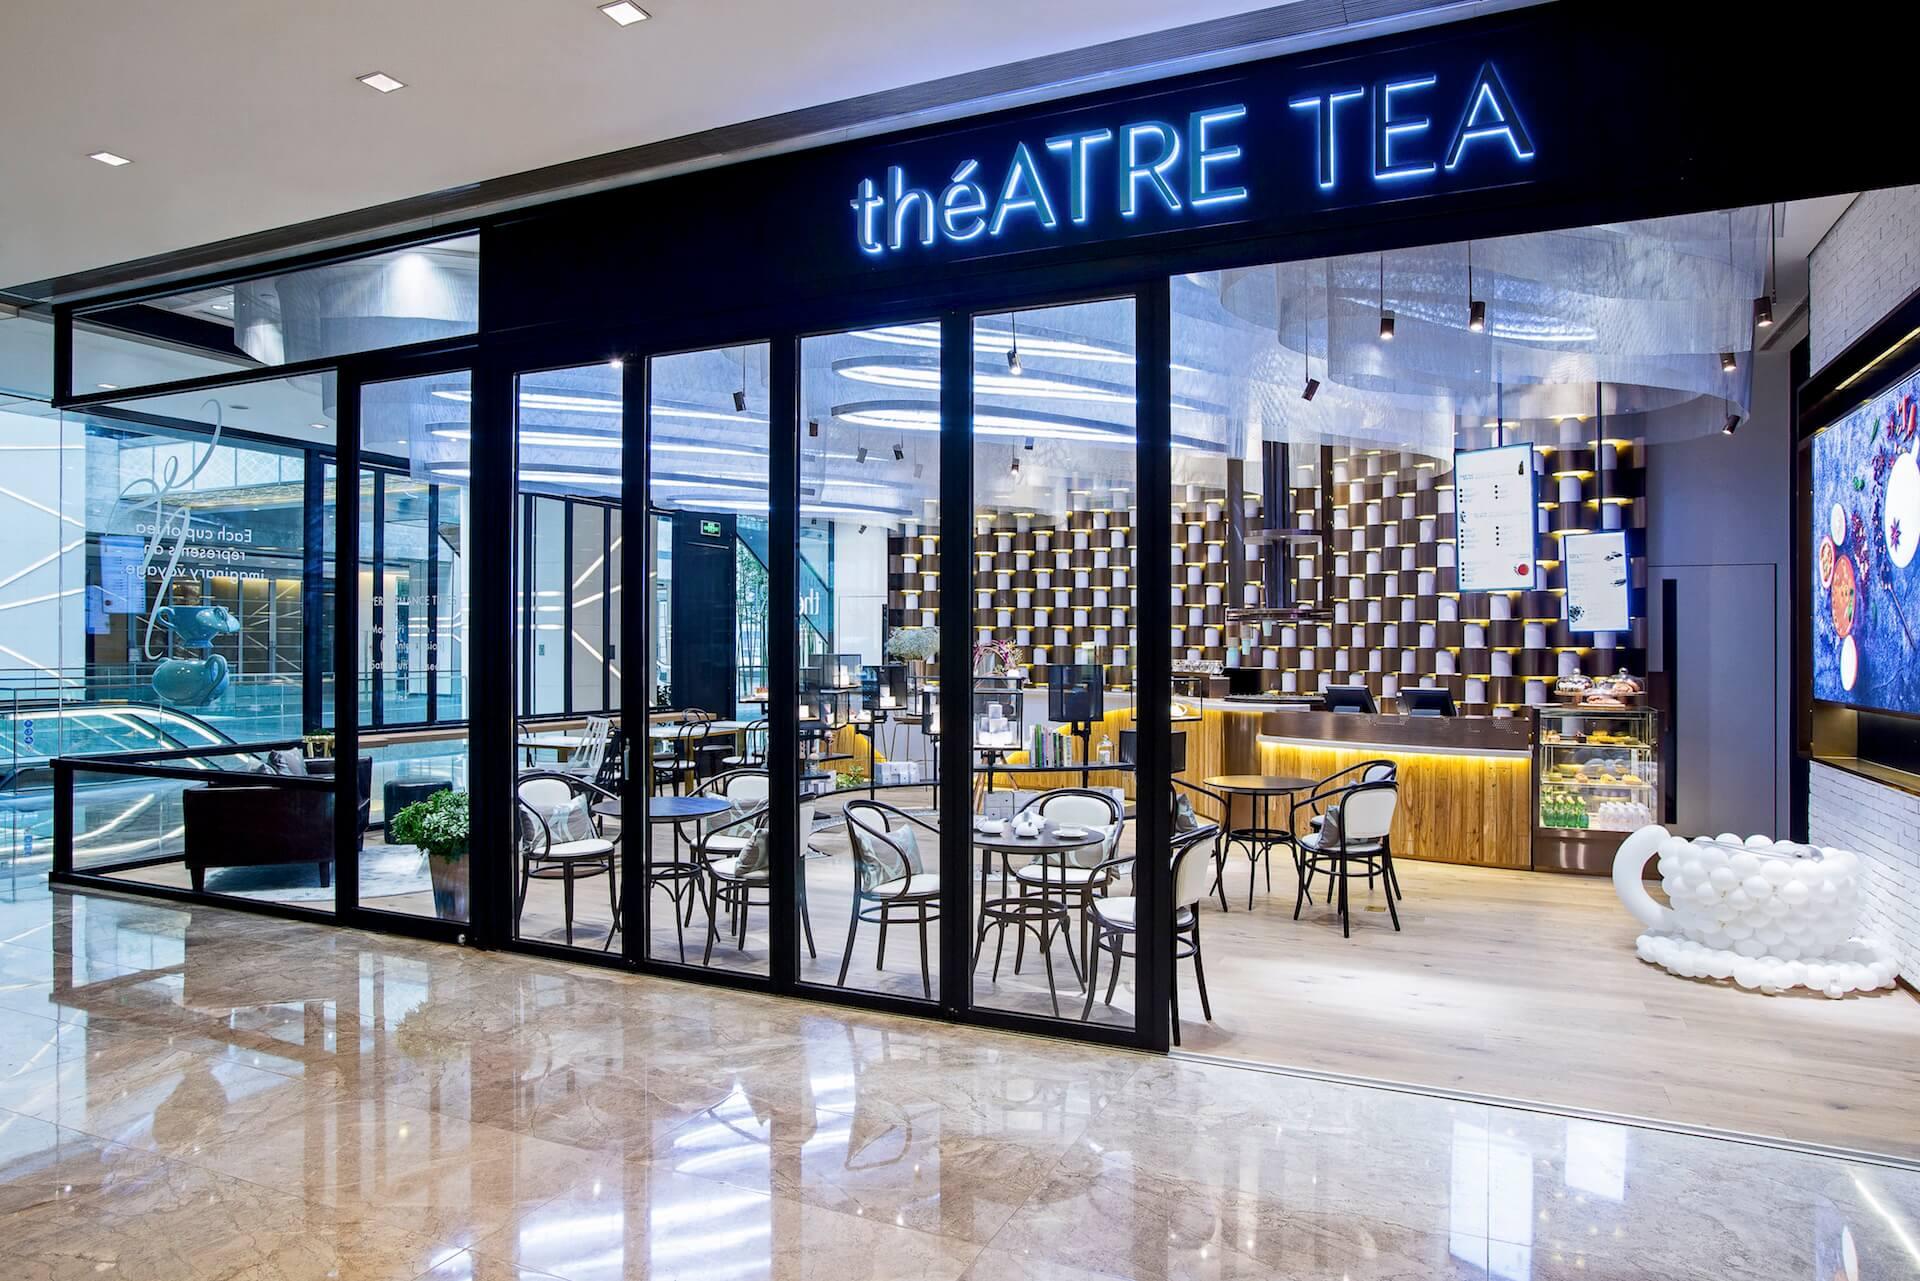 theATRE Tea - Store